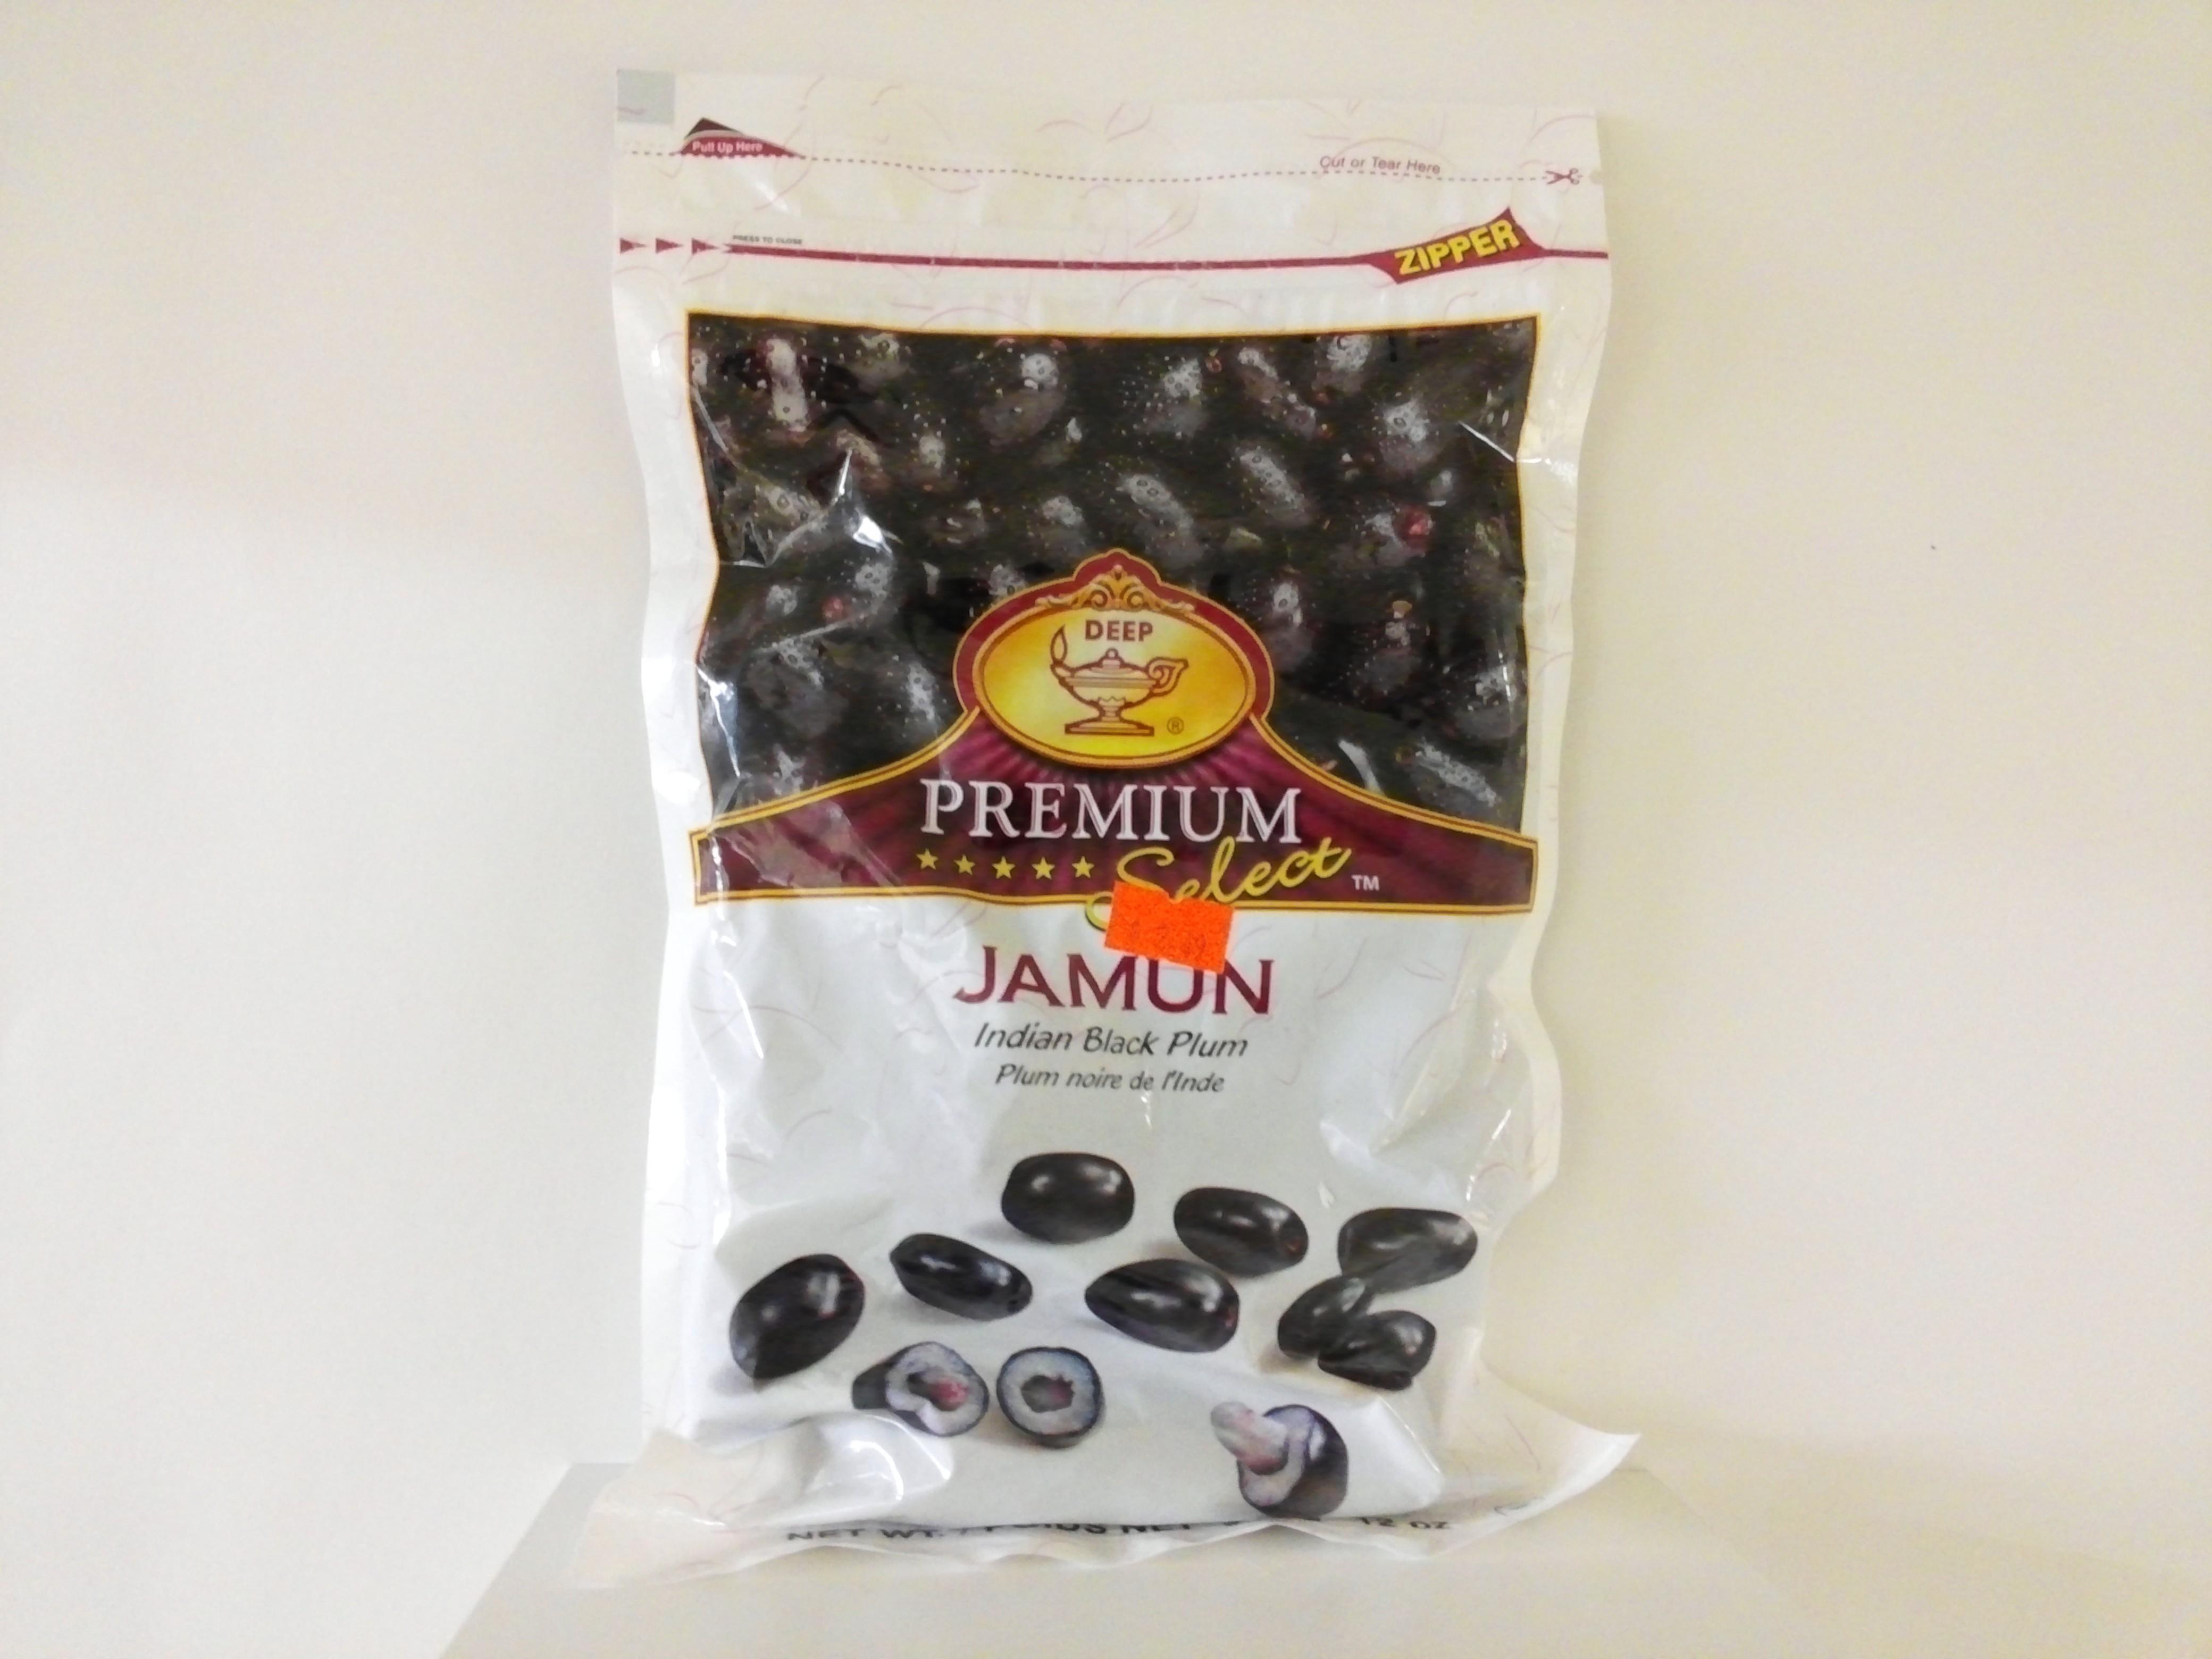 Deep Premium Jamun  12 oz